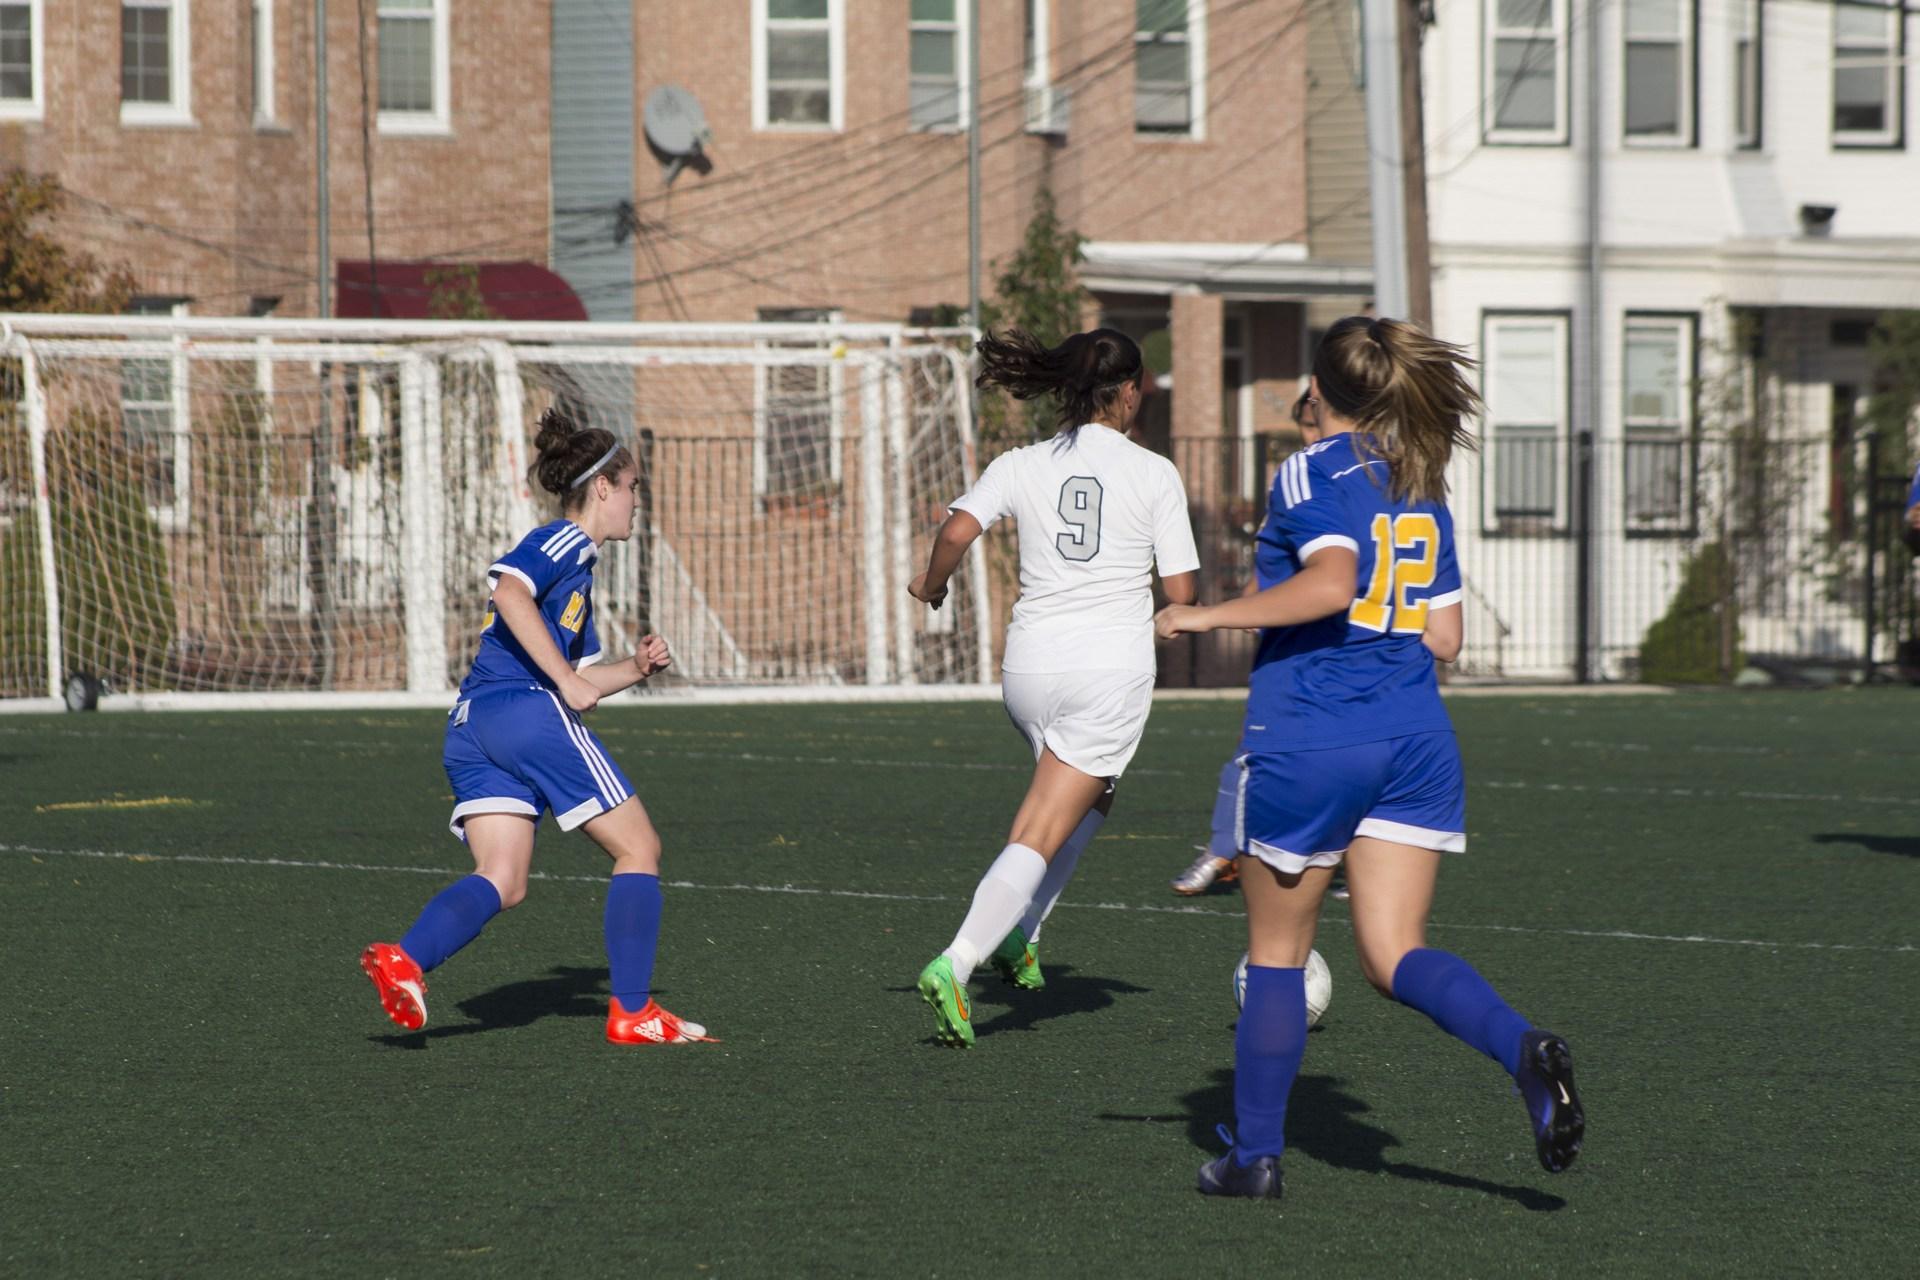 kicking to make a goal